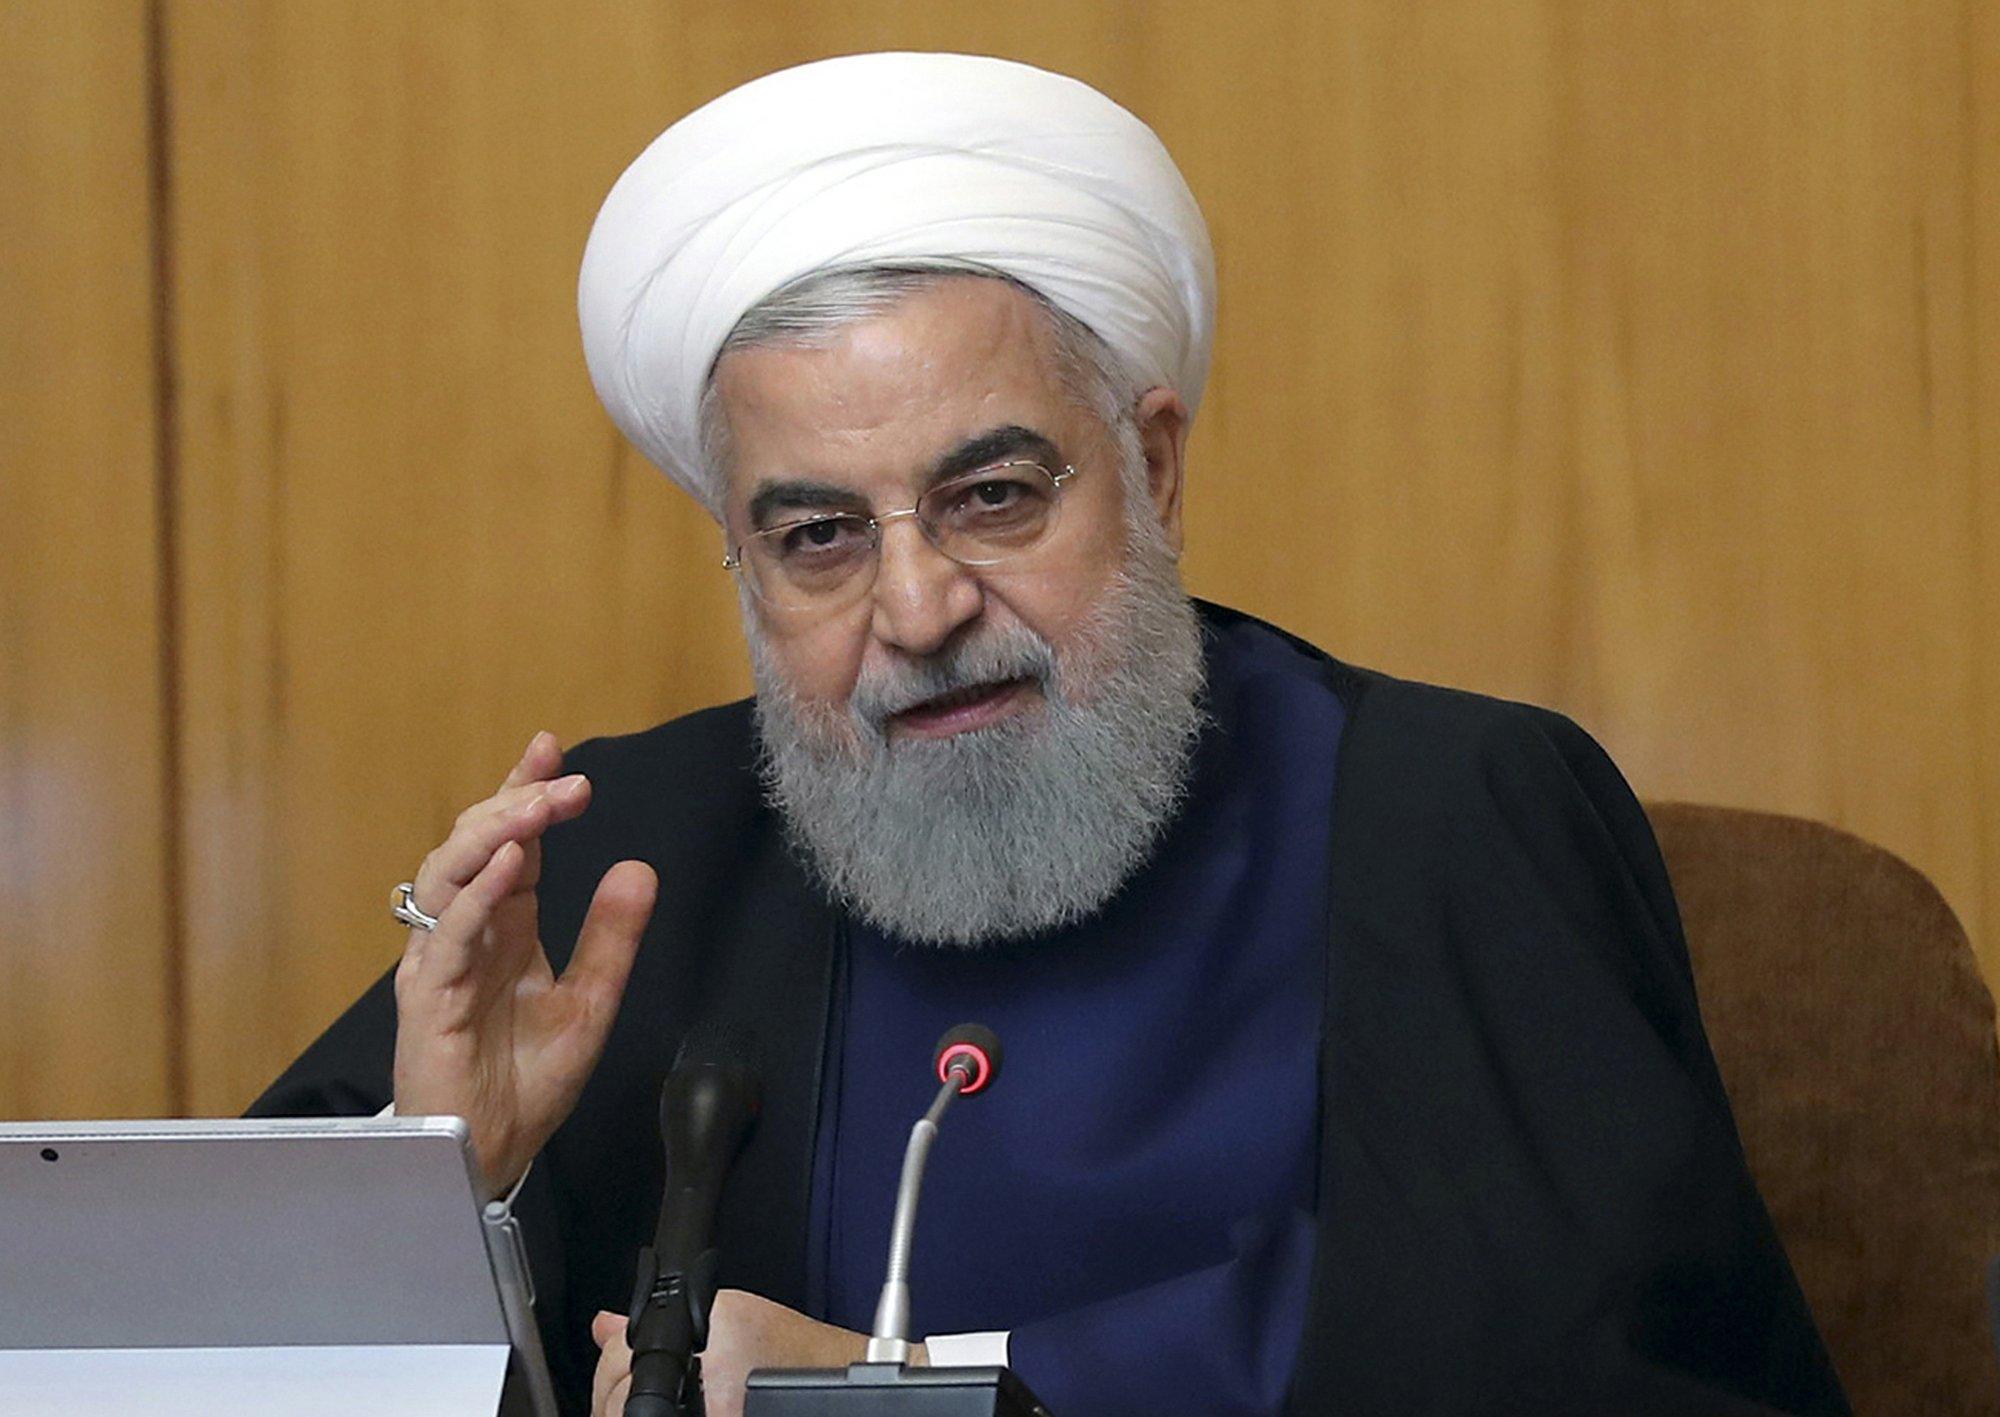 Hassan Rouhani_1557315331060.jpeg.jpg